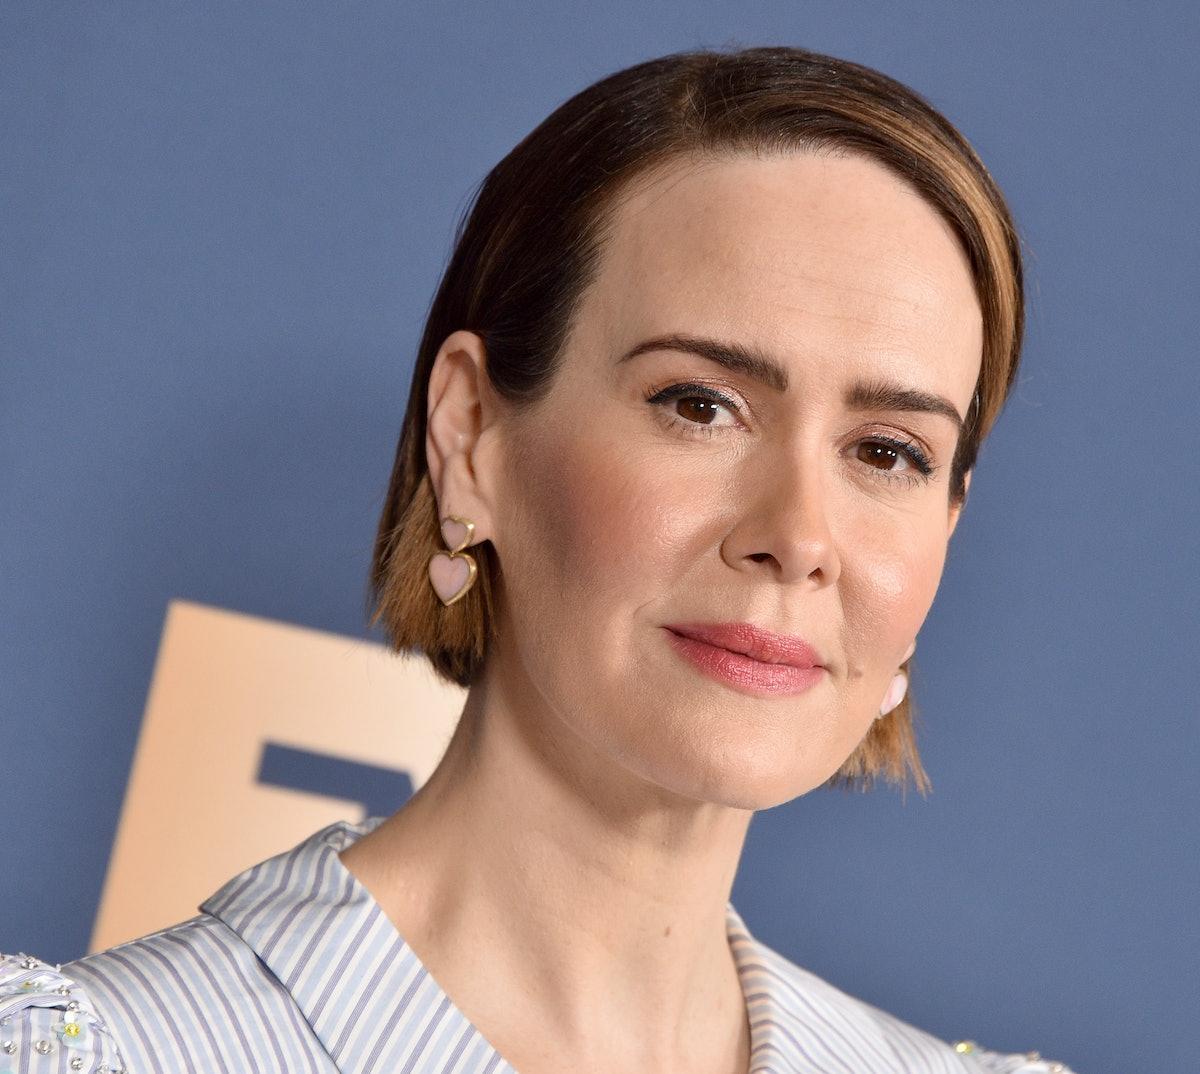 Sarah Paulson will play Linda Tripp in 'Impeachment: American Crime Story'